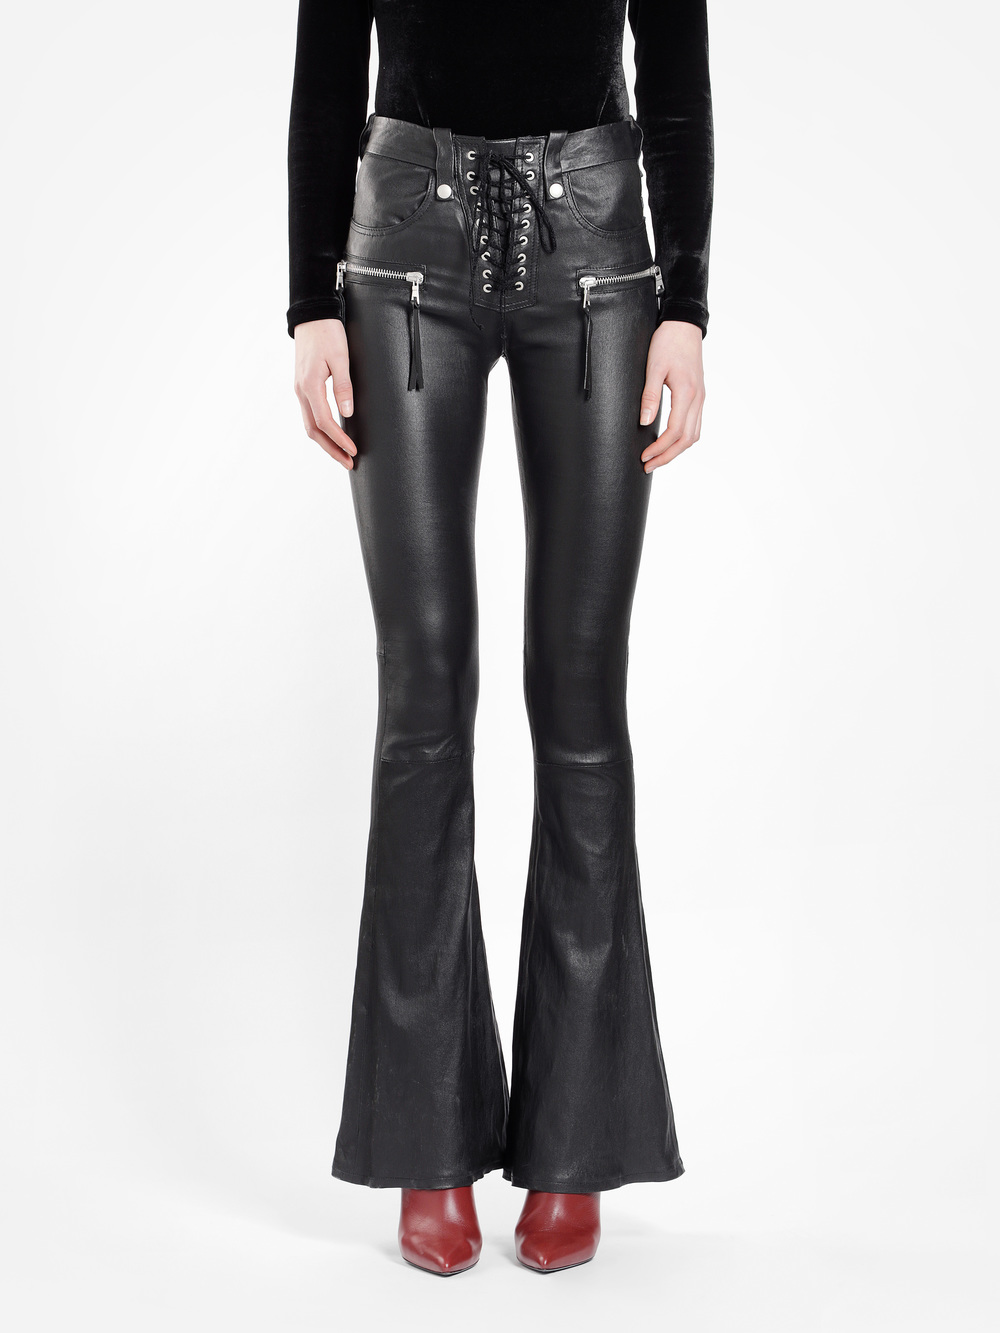 Ben taverniti Unravel by Antonioli, available on antonioli.eu for $2880 Kendall Jenner Pants Exact Product